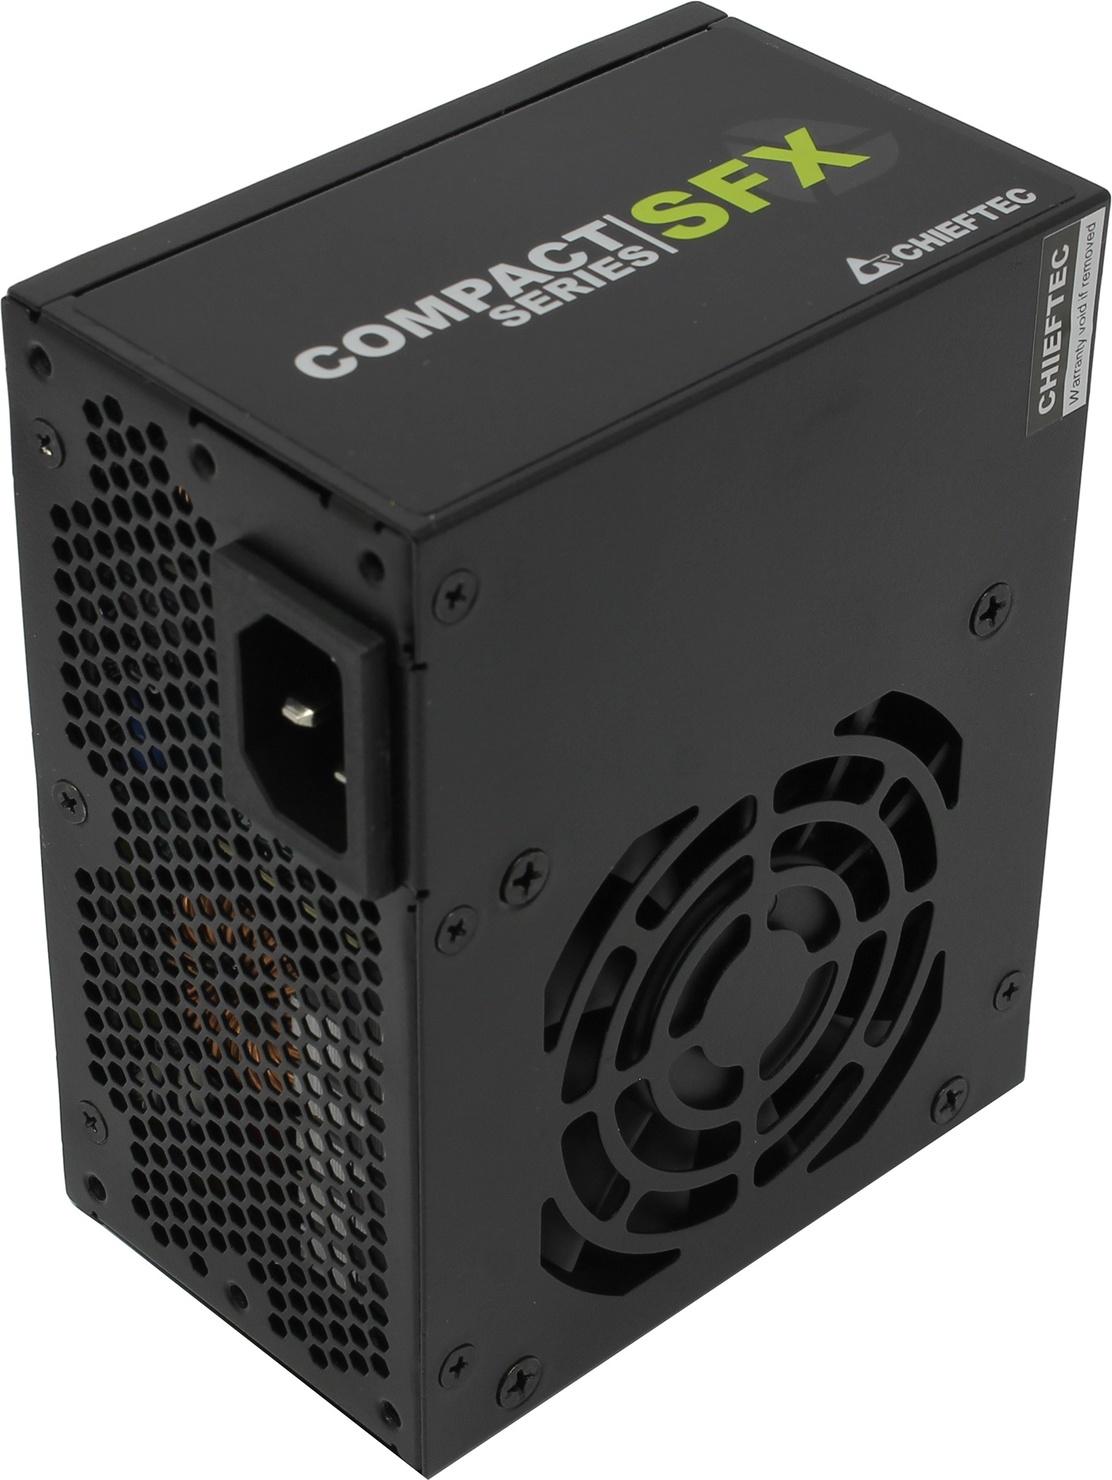 Блок питания Chieftec Compact CSN-650C SFX 80PLUS GOLD 650W Box